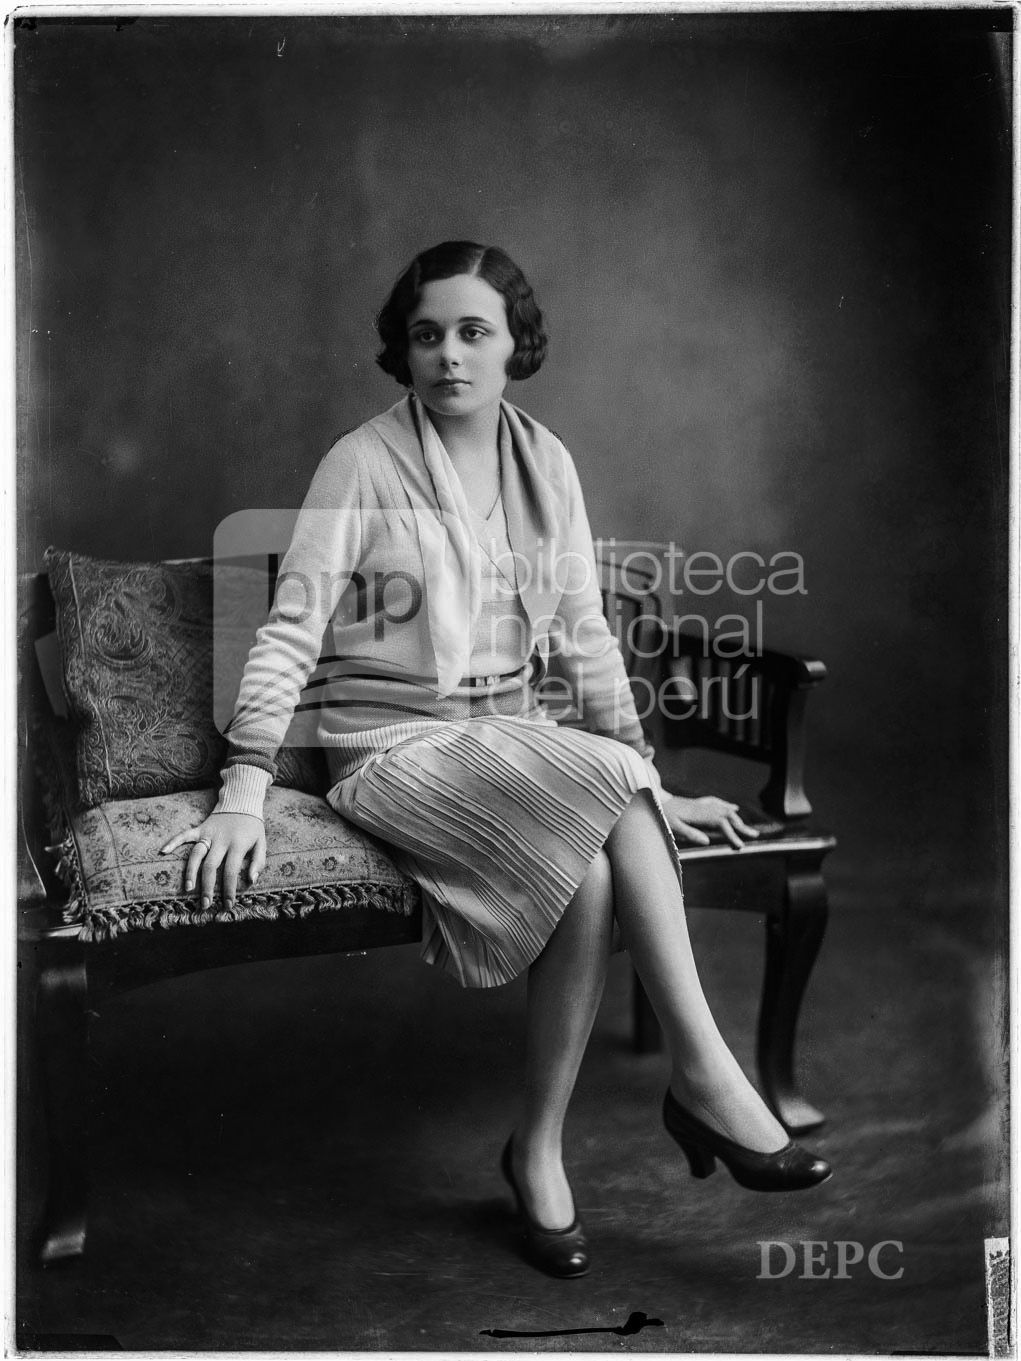 Teresa Díaz, Fotografia de Eugenio Courret, publicada en 1929 - Biblioteca Nacional del Perú